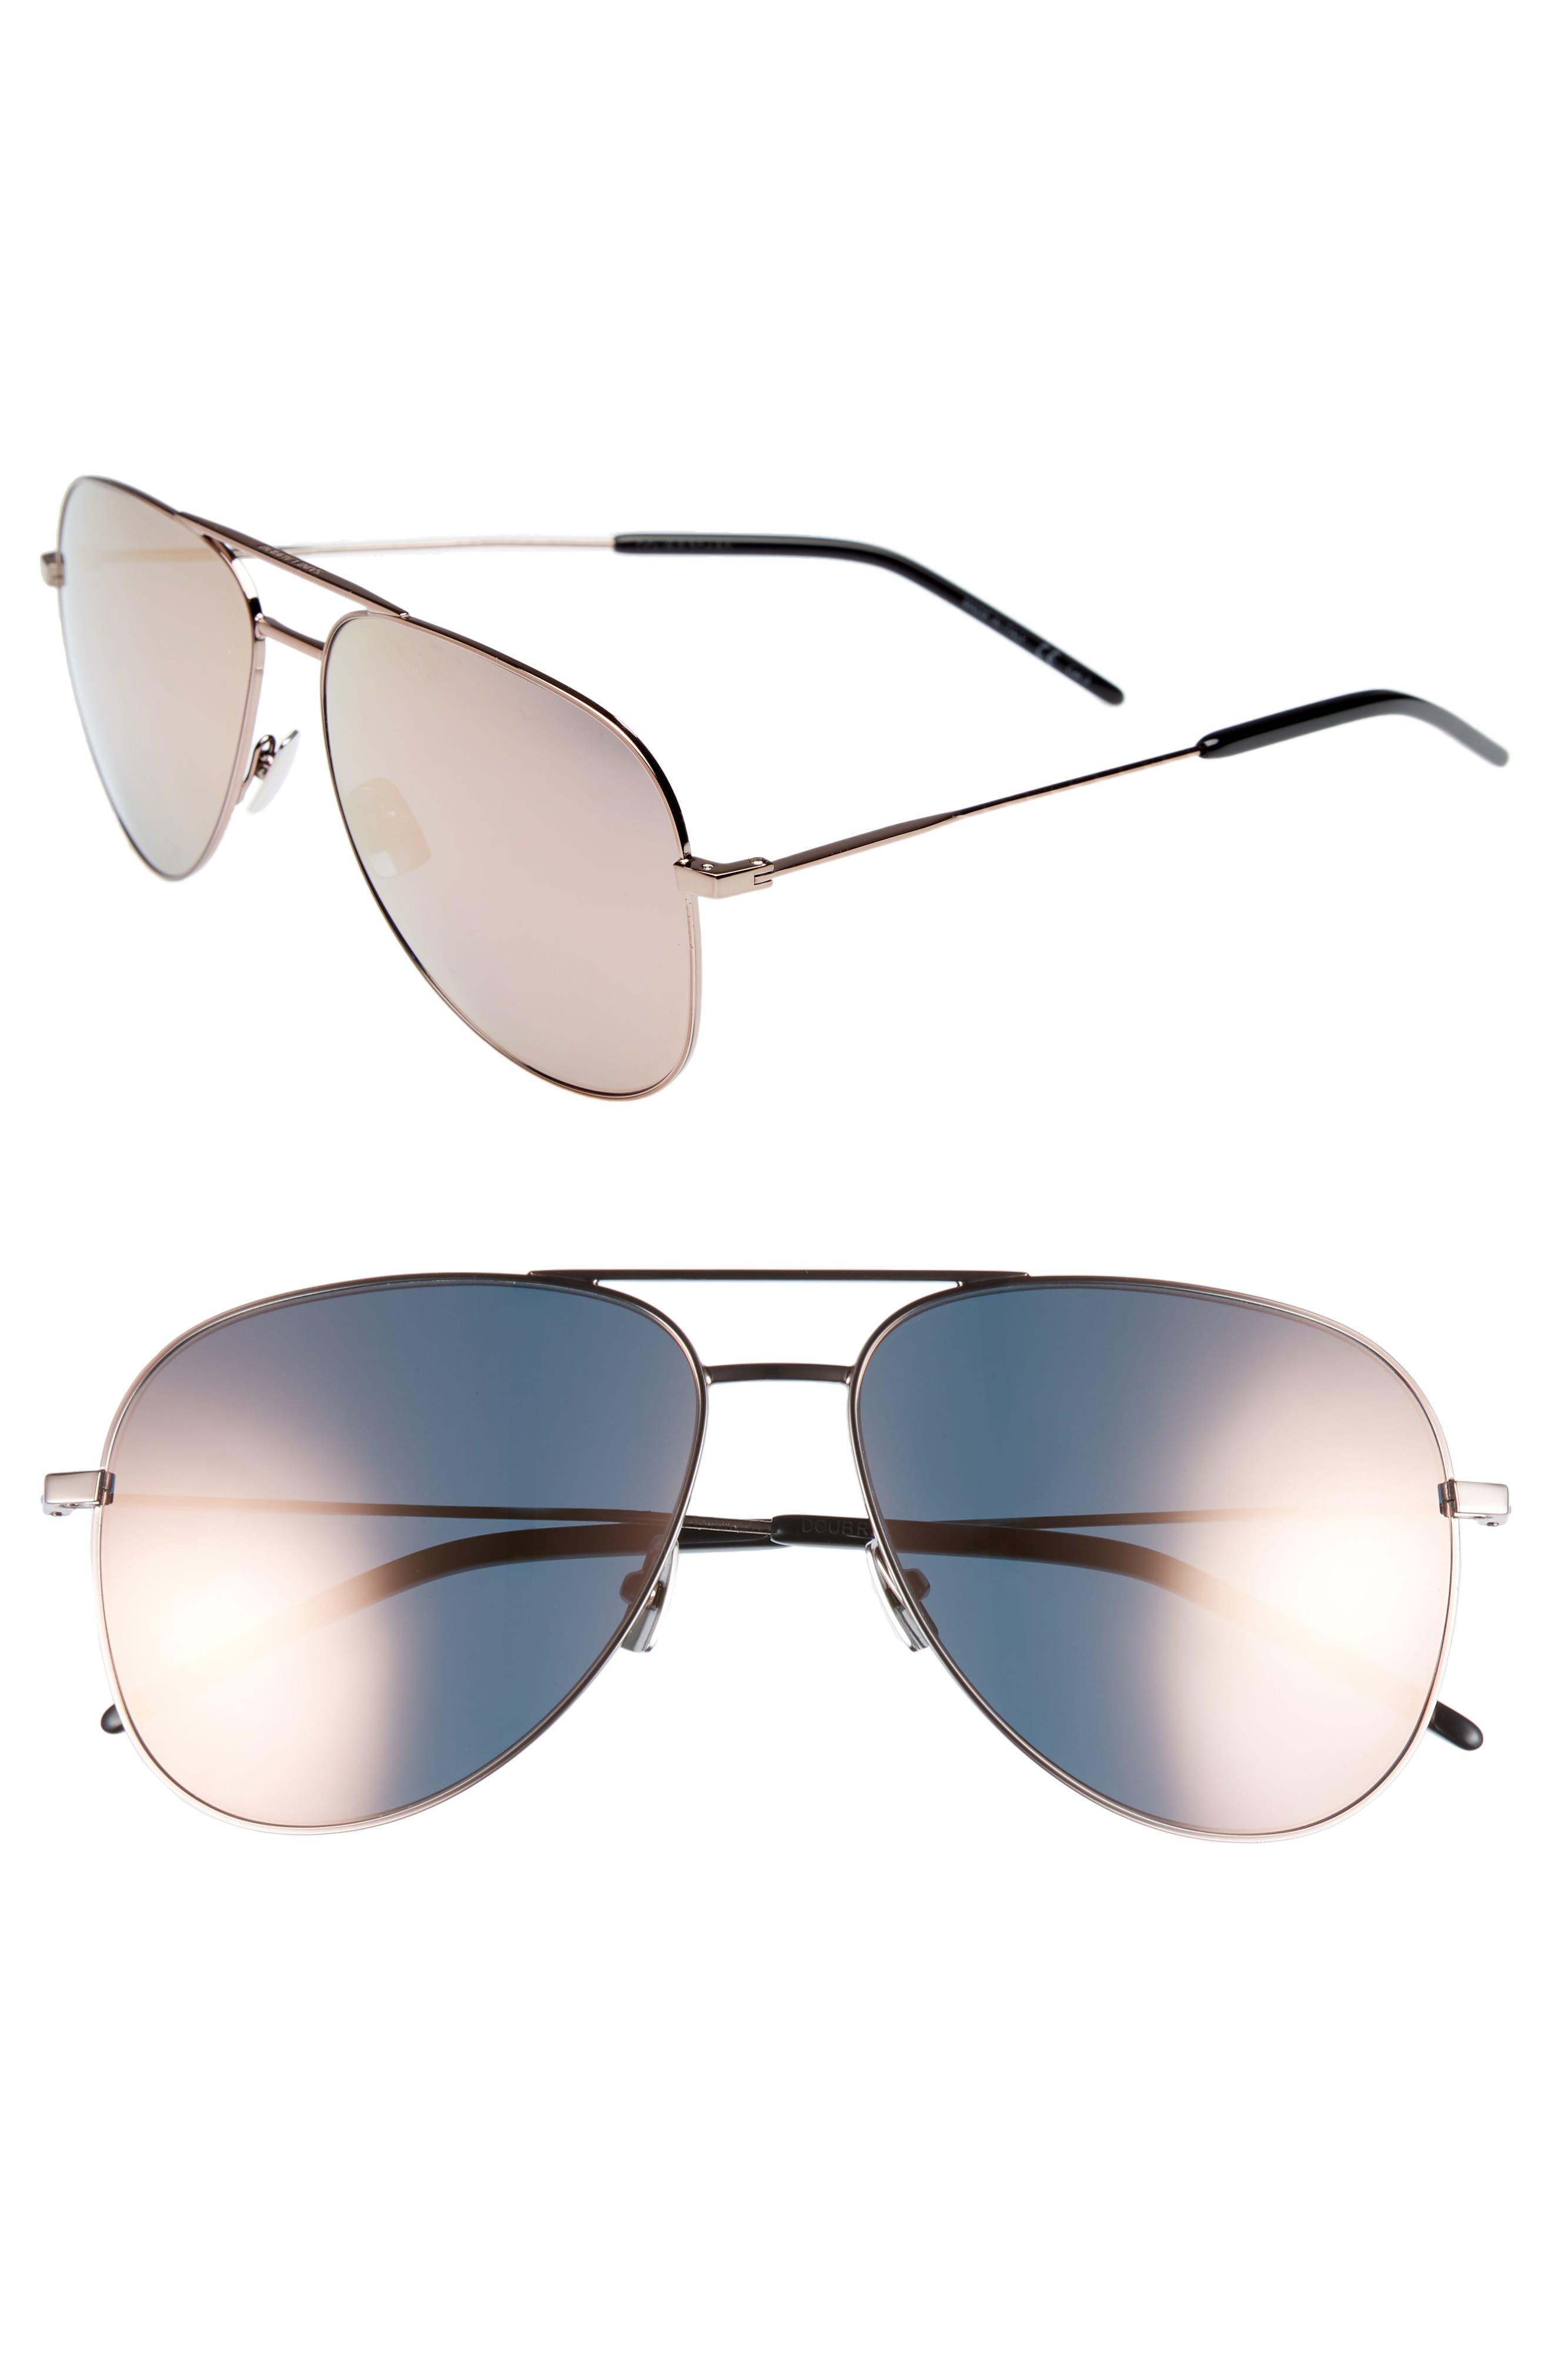 59mm Brow Bar Aviator Sunglasses,                             Main thumbnail 1, color,                             Champagne